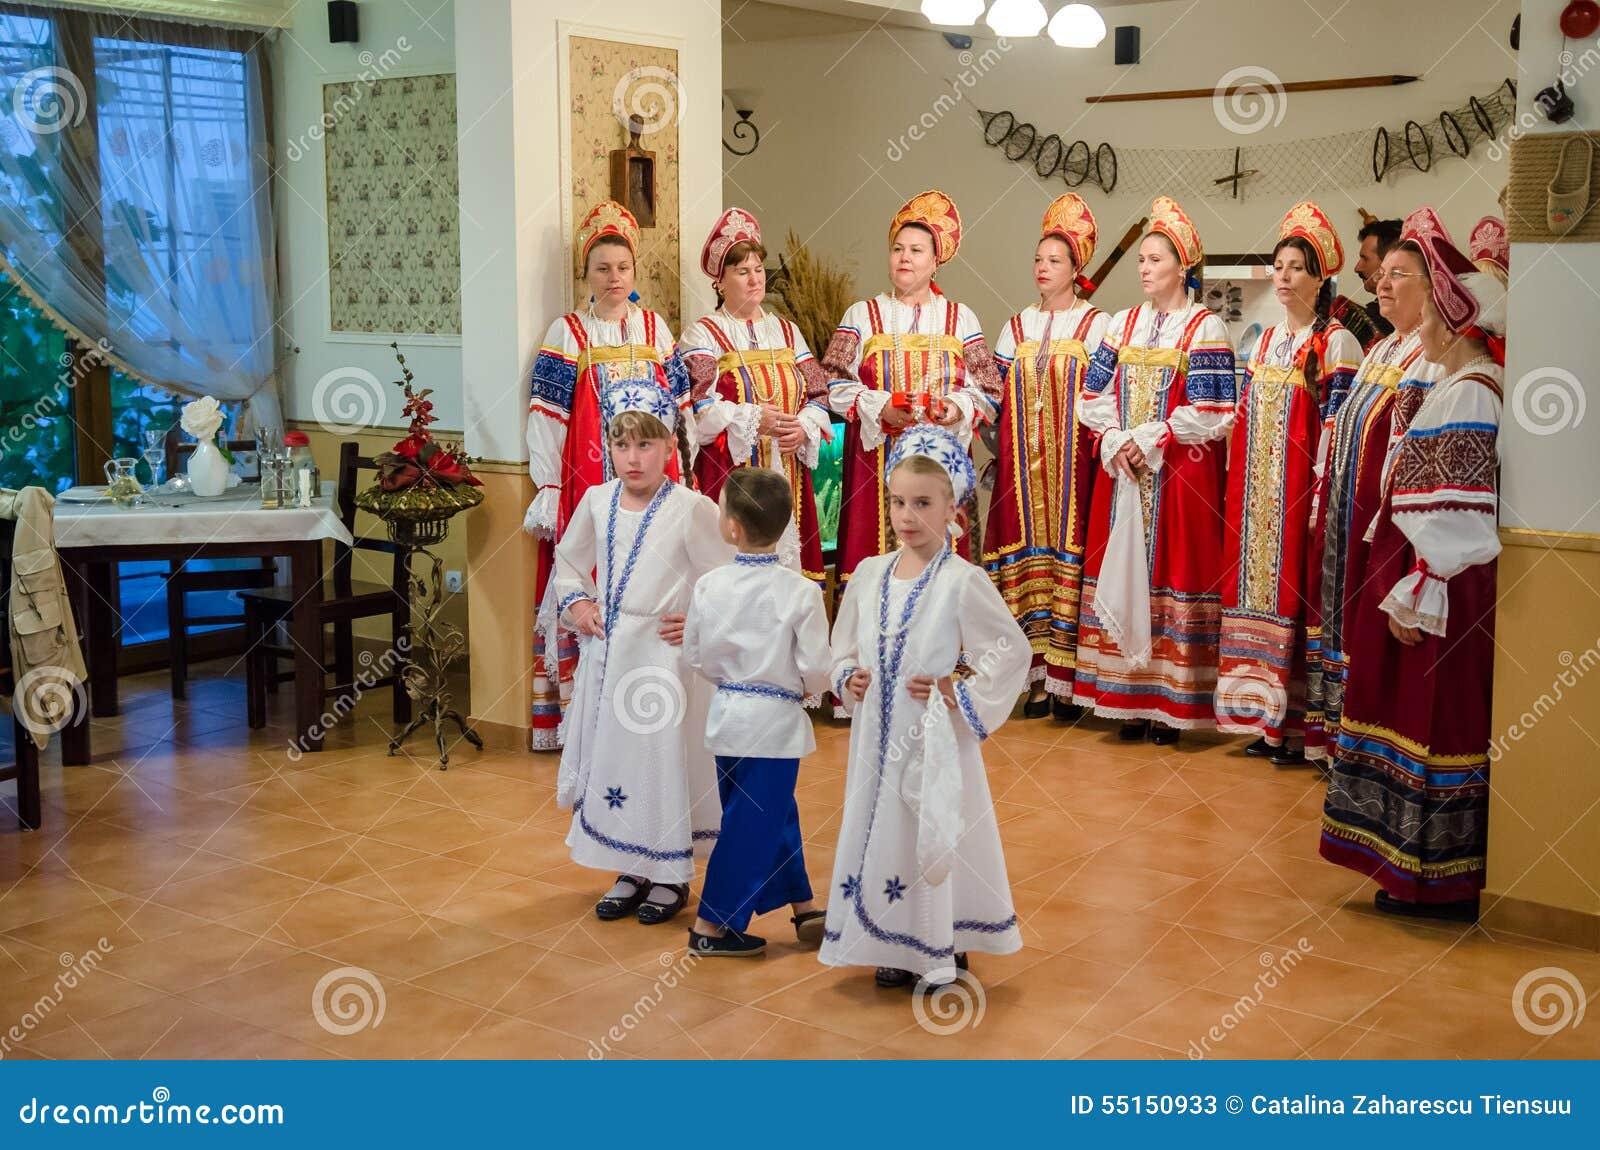 Women Choir Singing Traditional Lipovans Songs In Delta